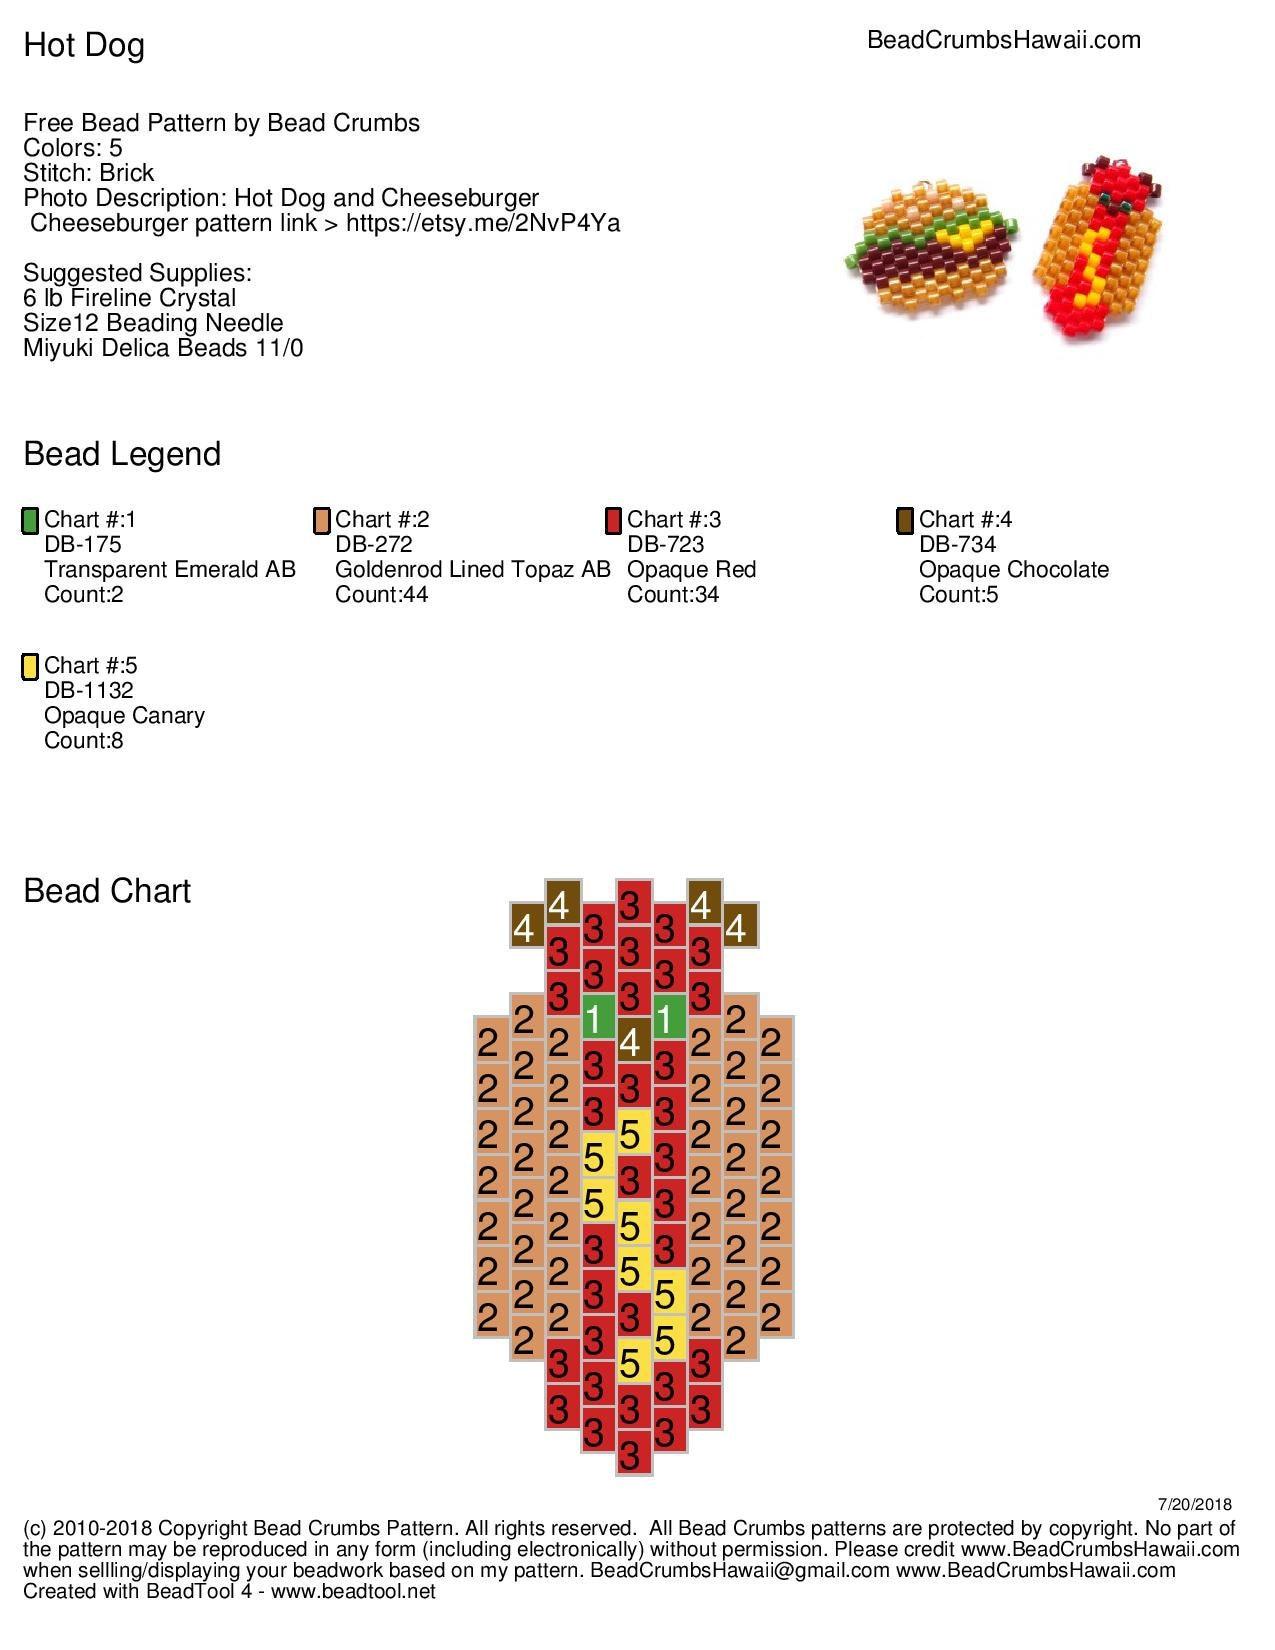 Free brick stitch hot dog bead pattern by Bead Crumbs